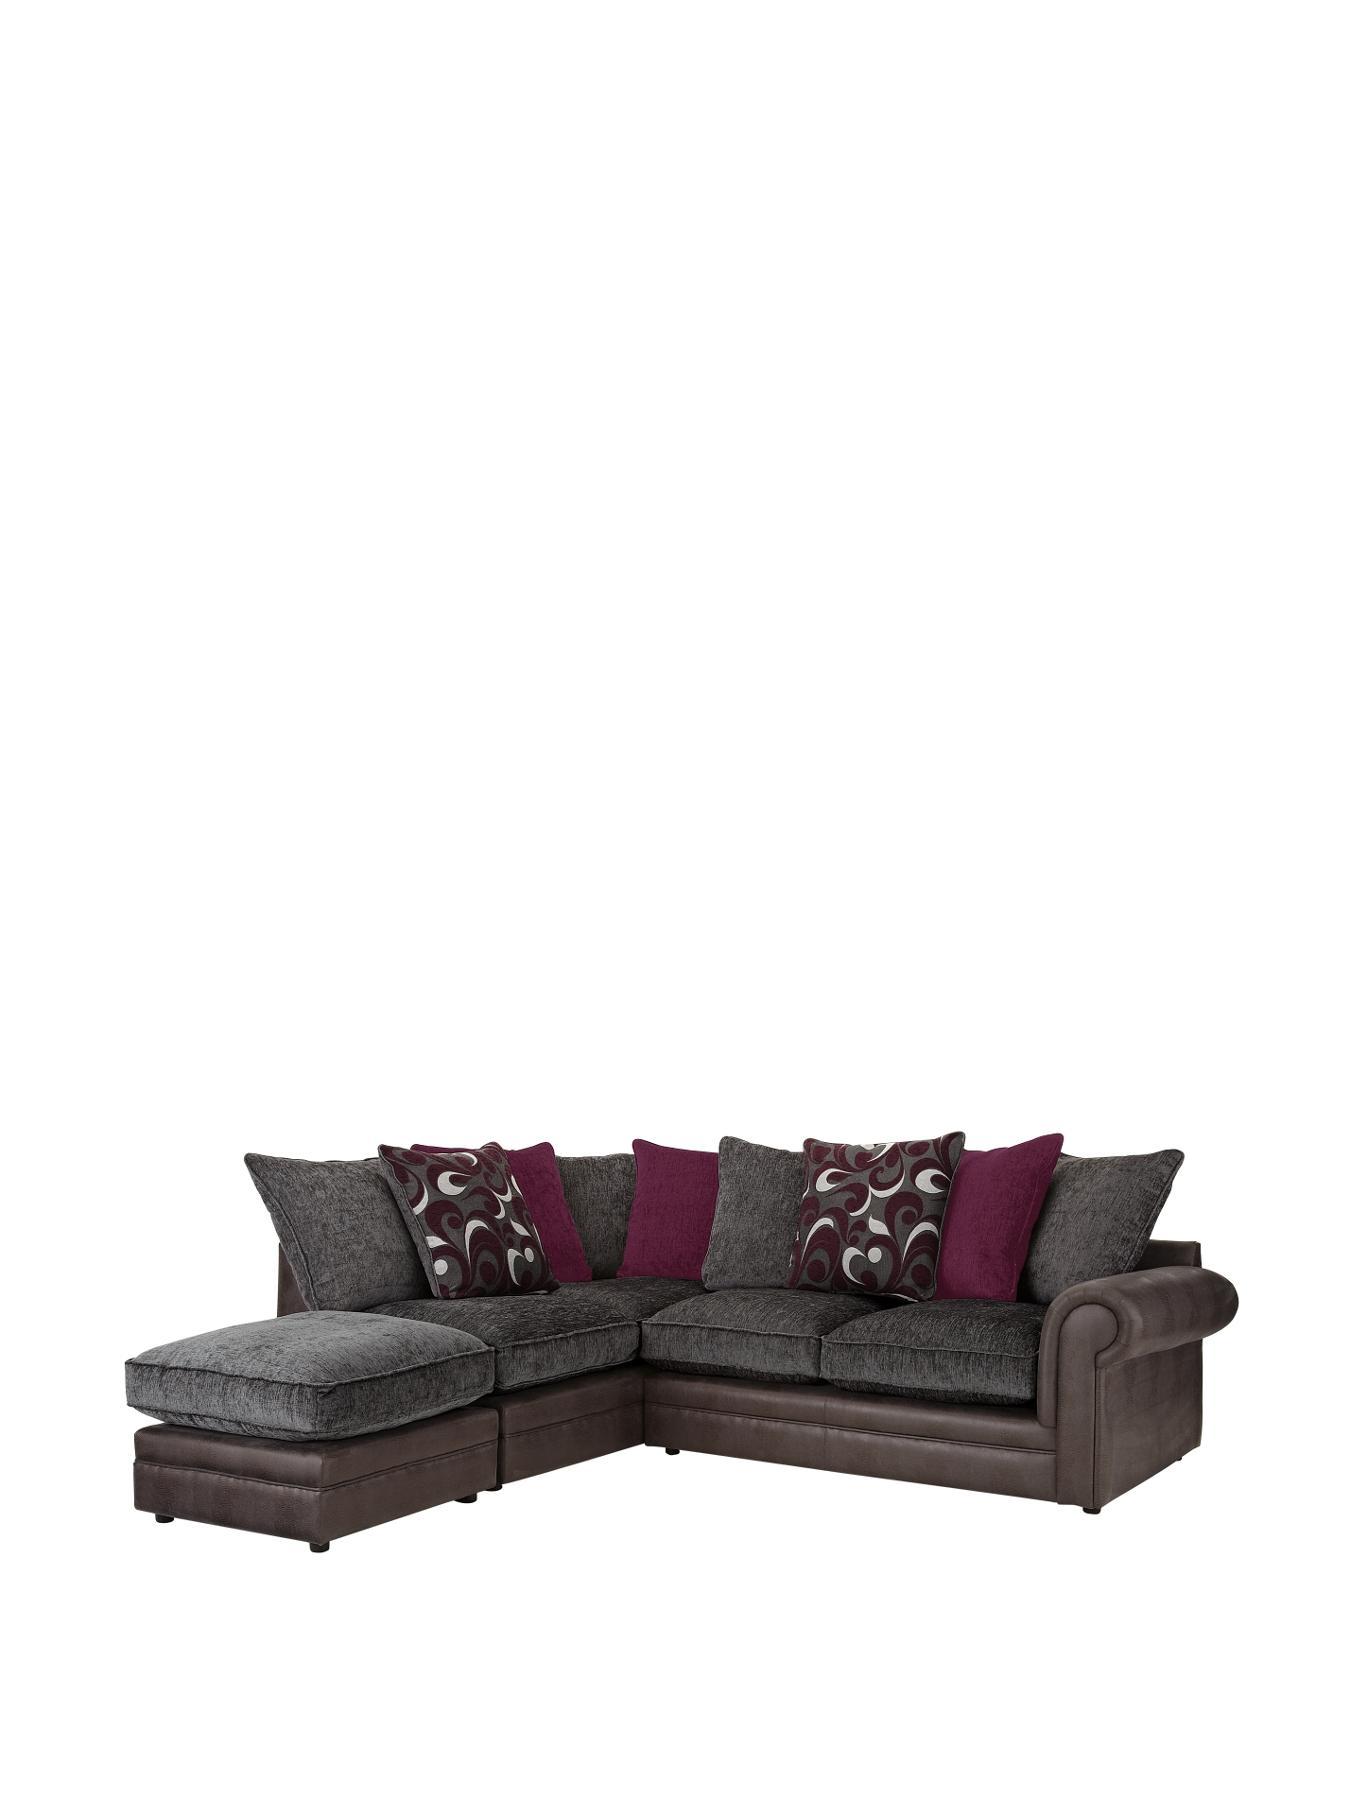 Catarina LeftHand Corner Group Sofa and Footstool ChocolateBlack